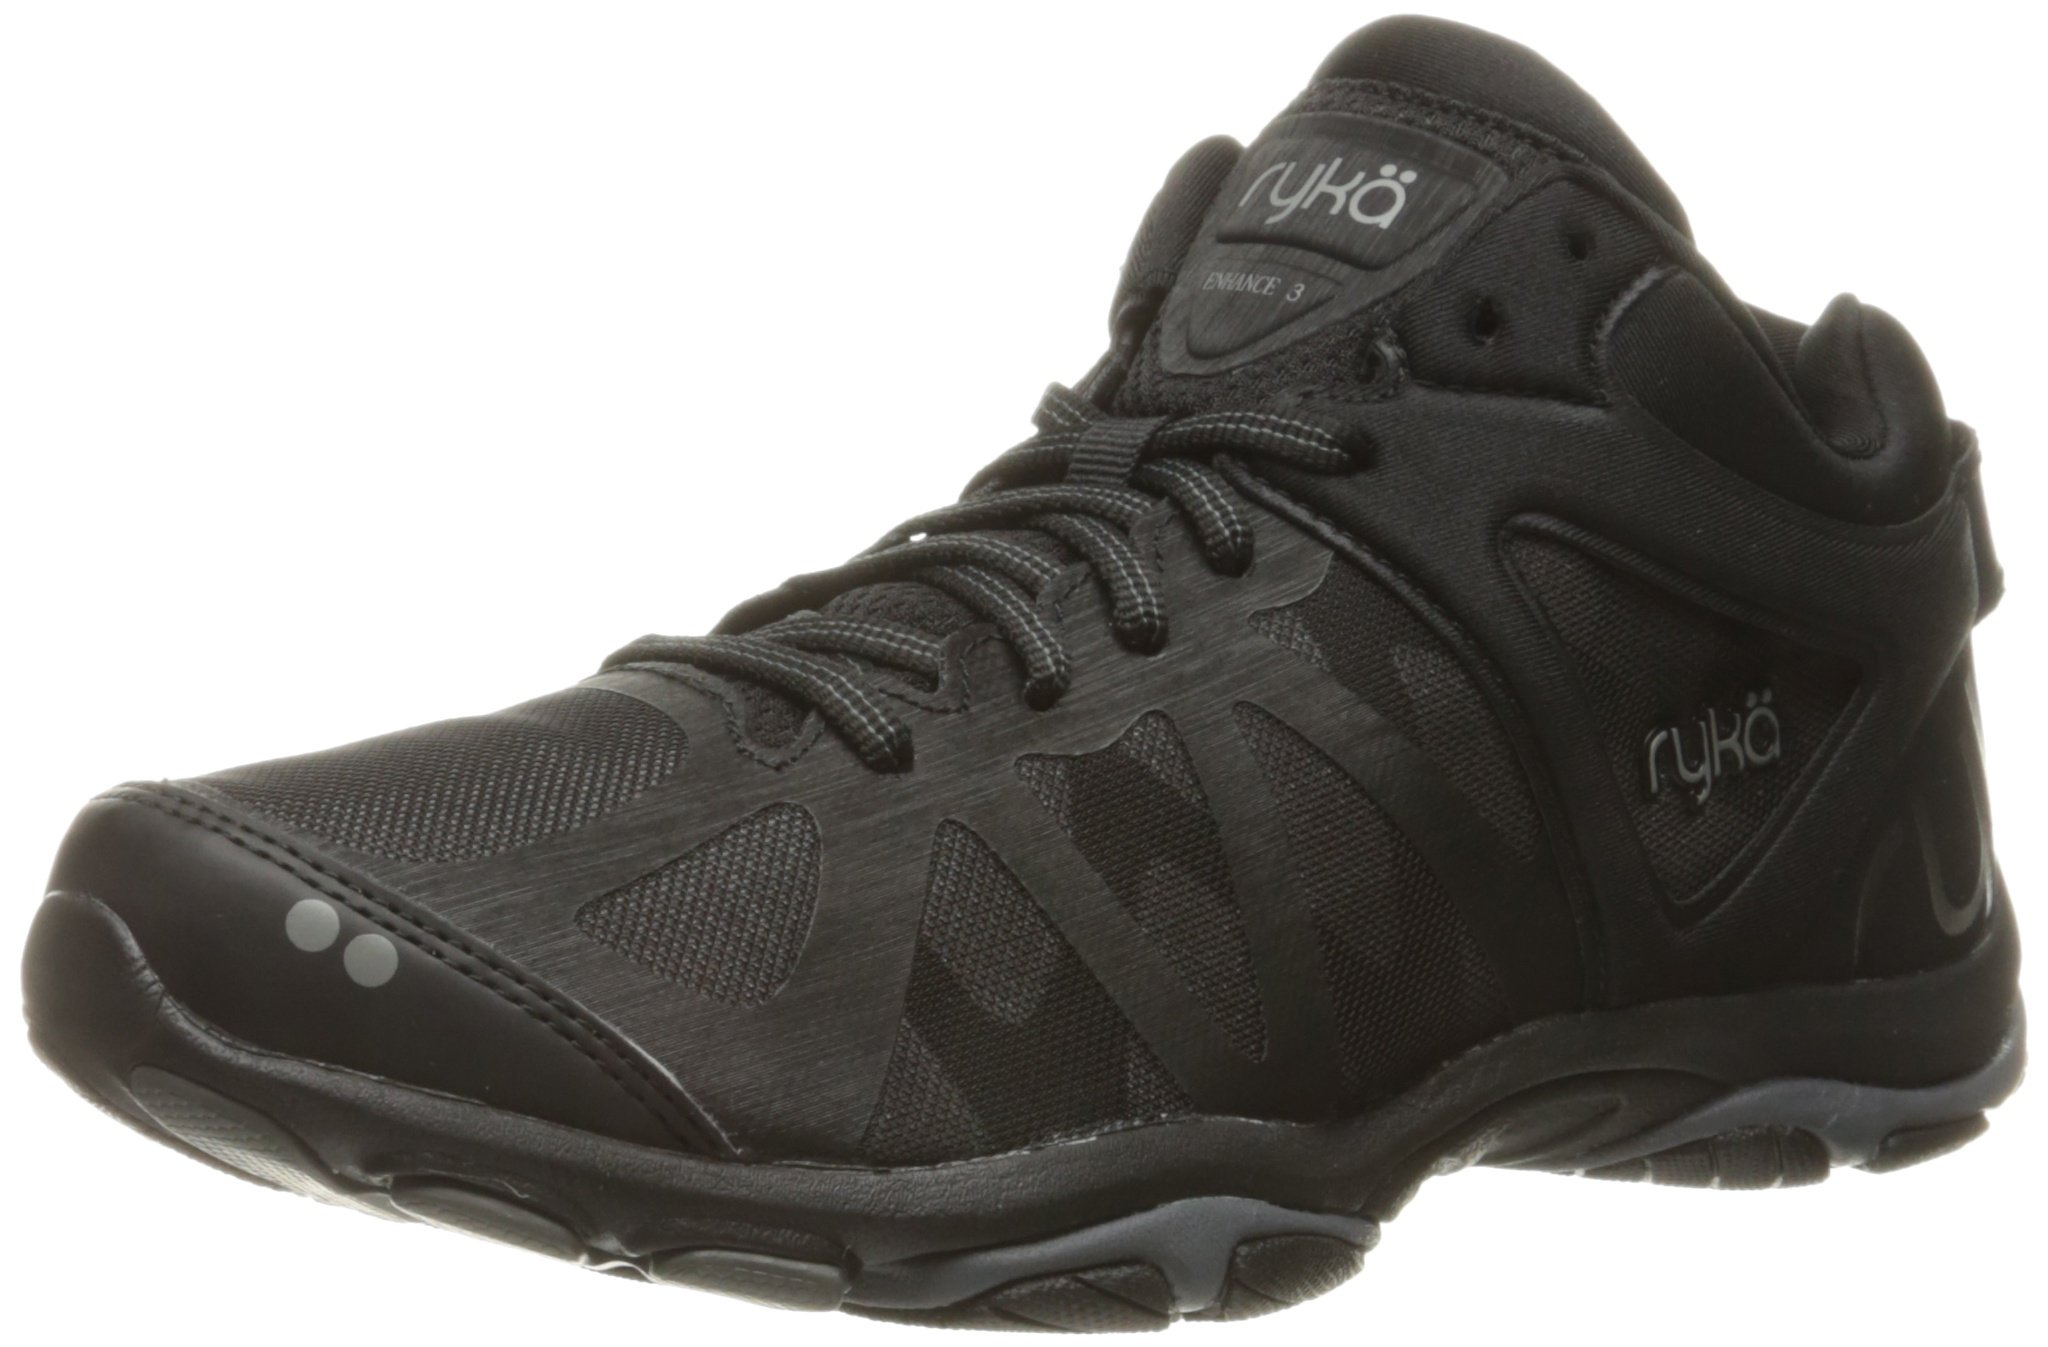 Ryka Women's Enhance 3 Cross-Trainer Shoe, Black/Grey, 8 M US